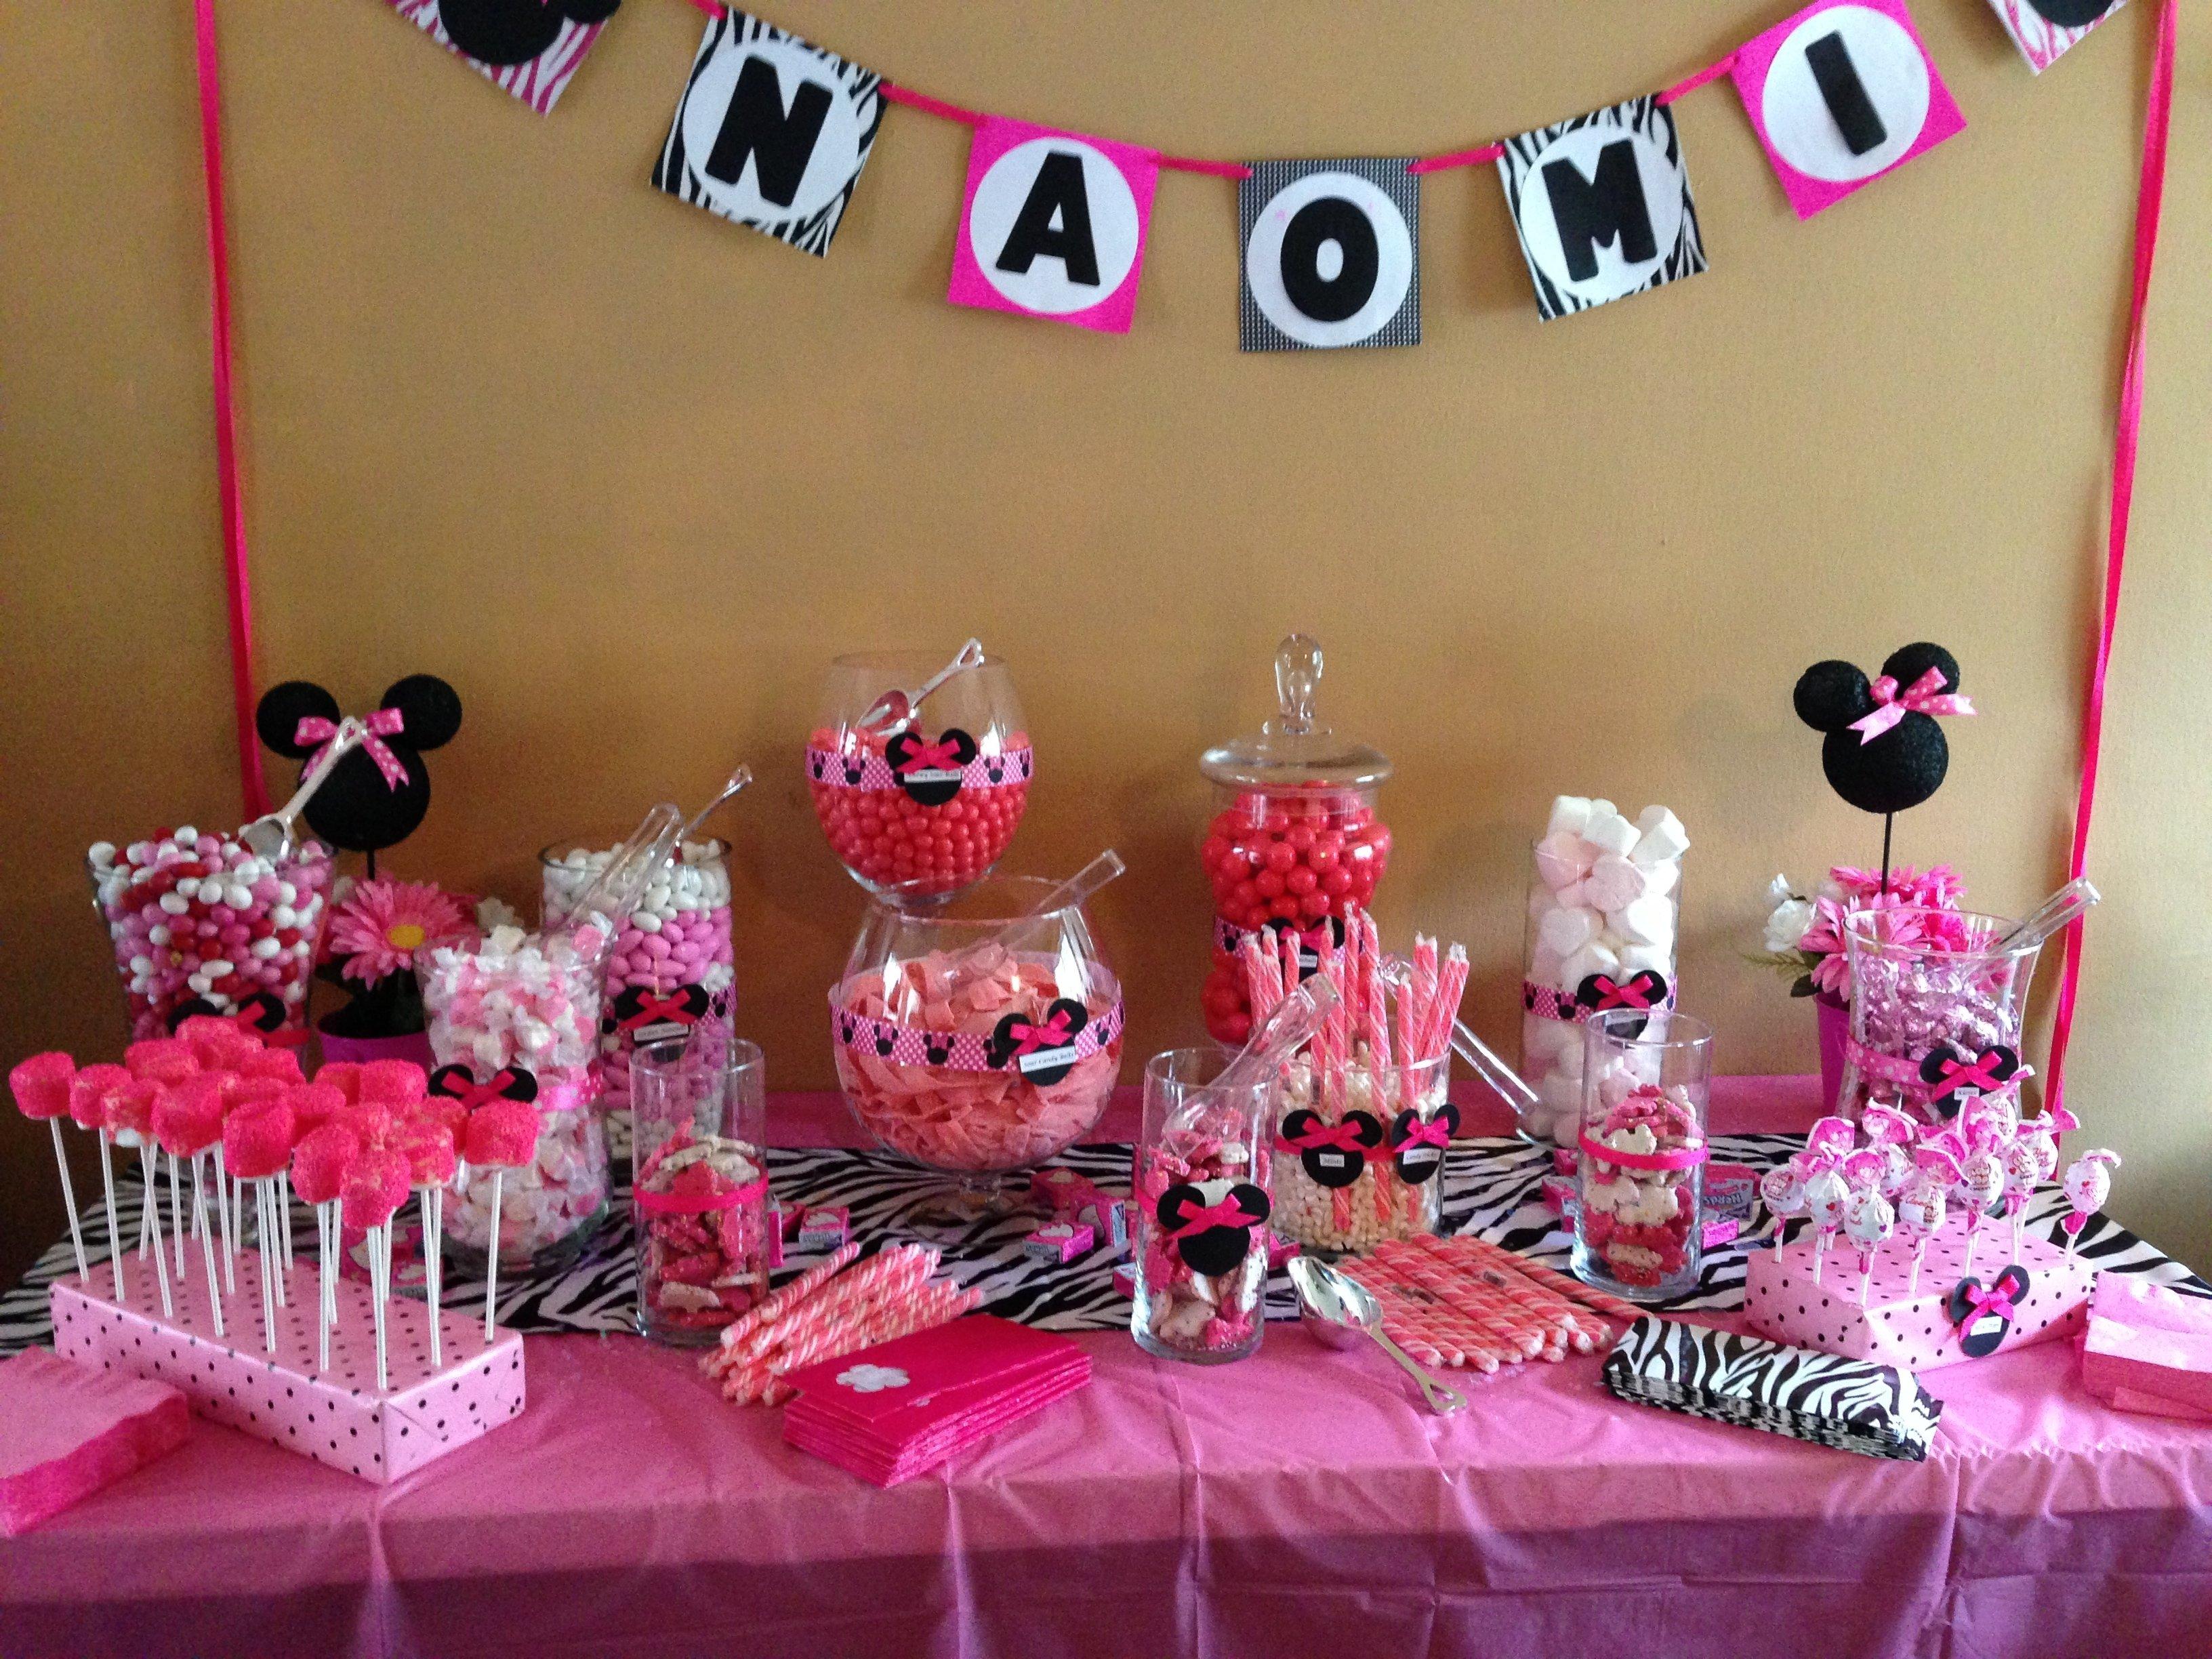 10 Wonderful Minnie Mouse Candy Bar Ideas pindana wimbish on more birthday party ideas deco pinterest 2021